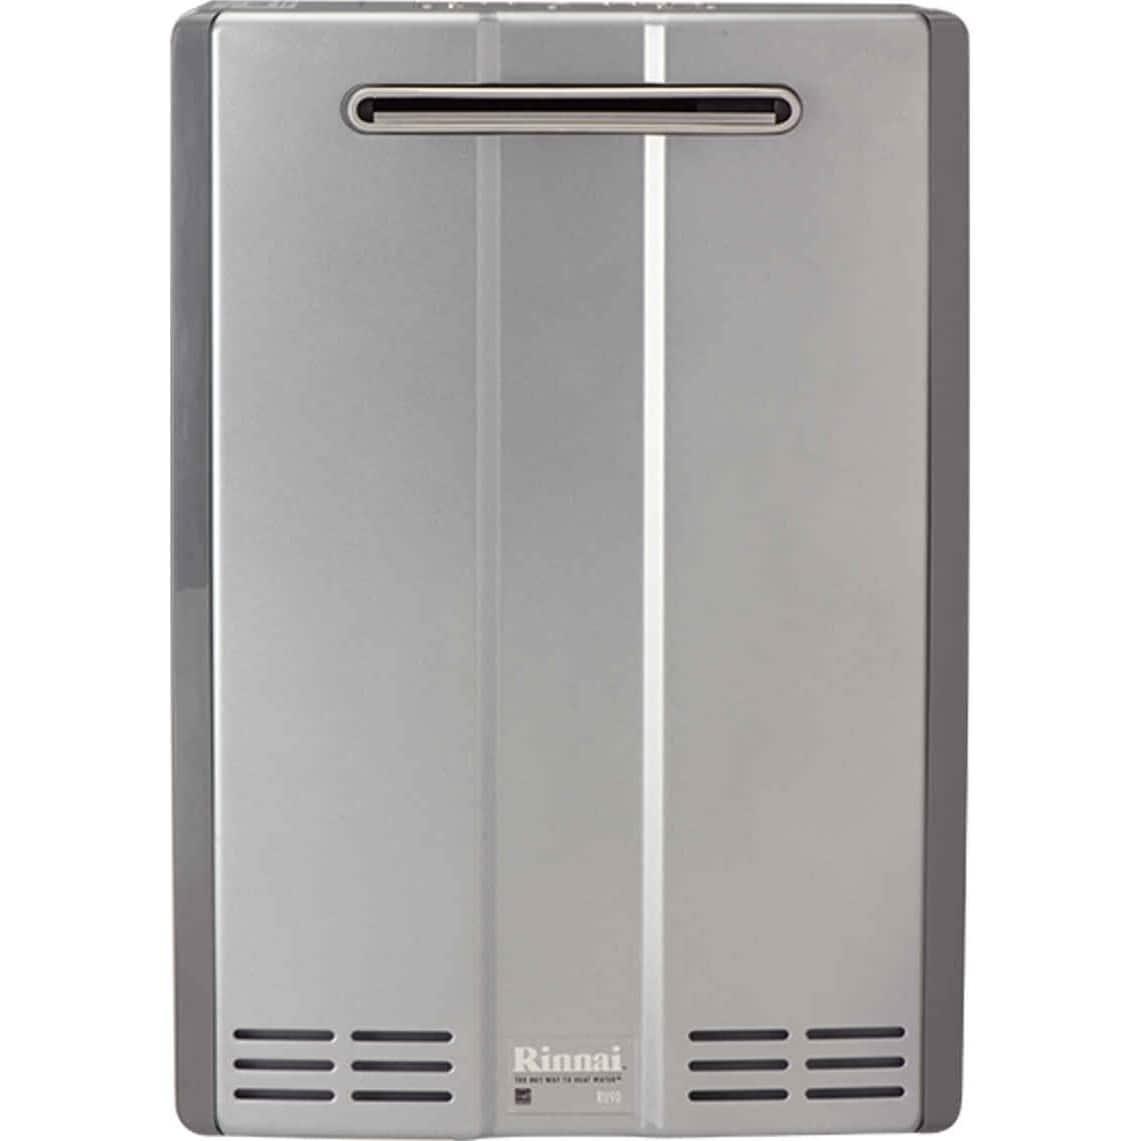 Rinnai Ultra Tankless Water Heater RUR98eN - Silver (Silv...